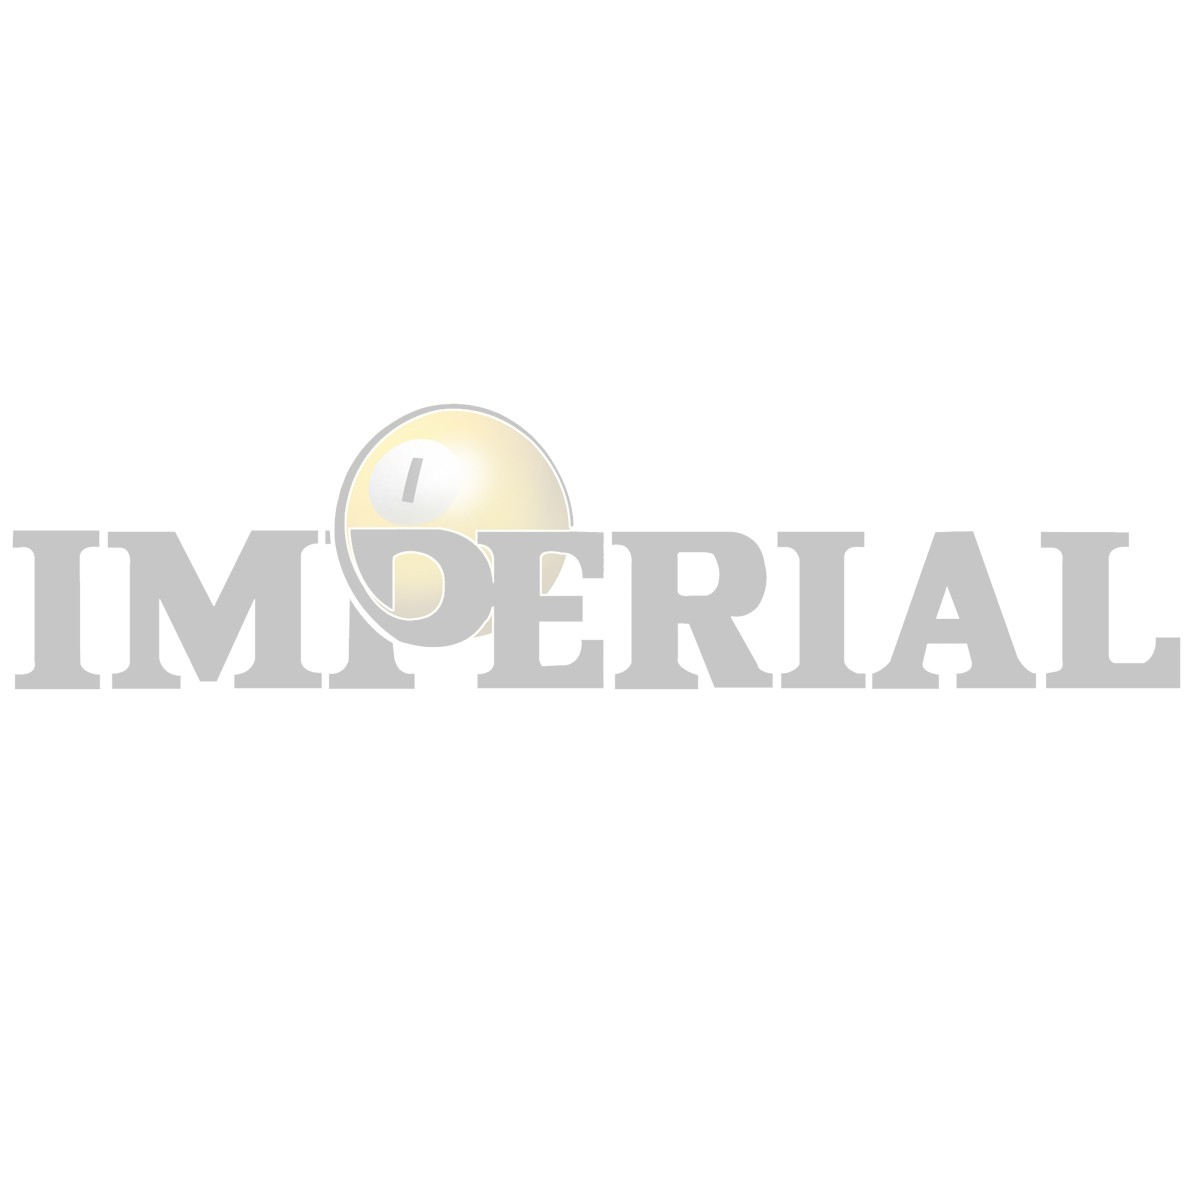 Pittsburgh Penguins® 9-foot Billiard Cloth